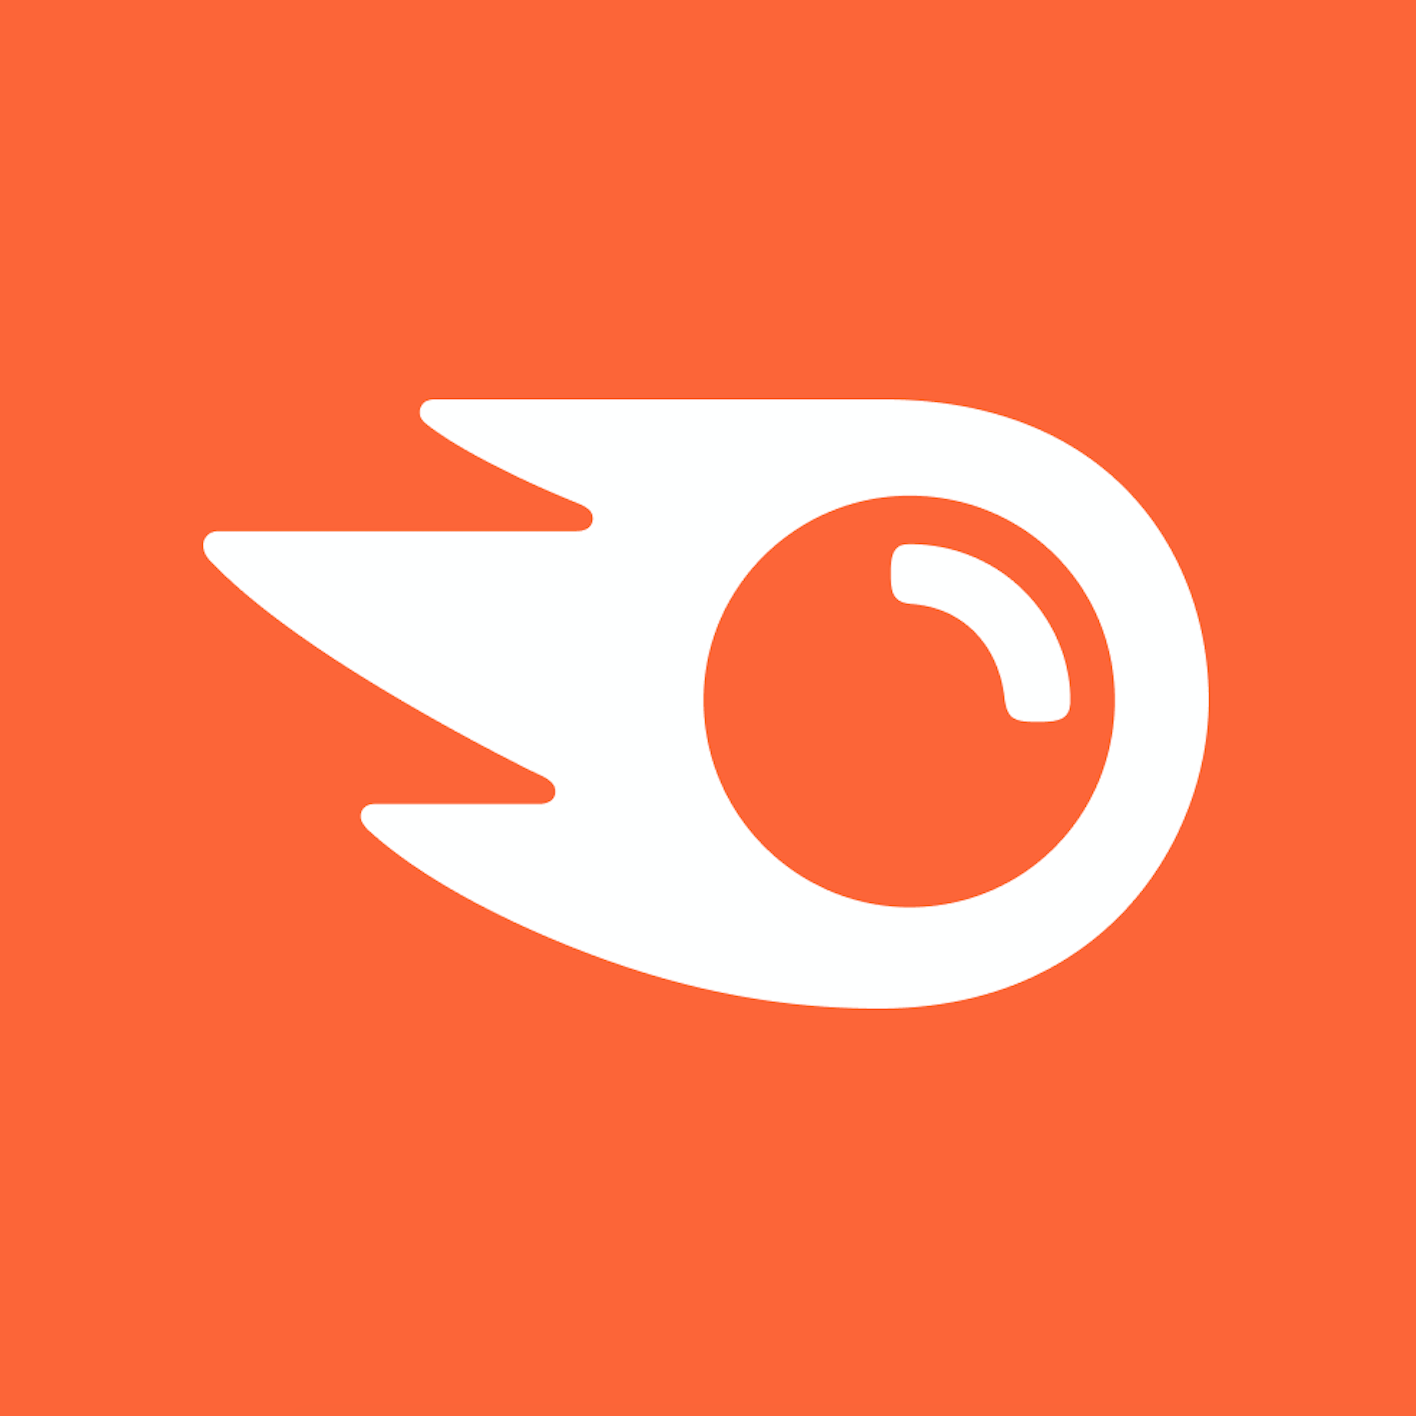 Логотип компании «Semrush»